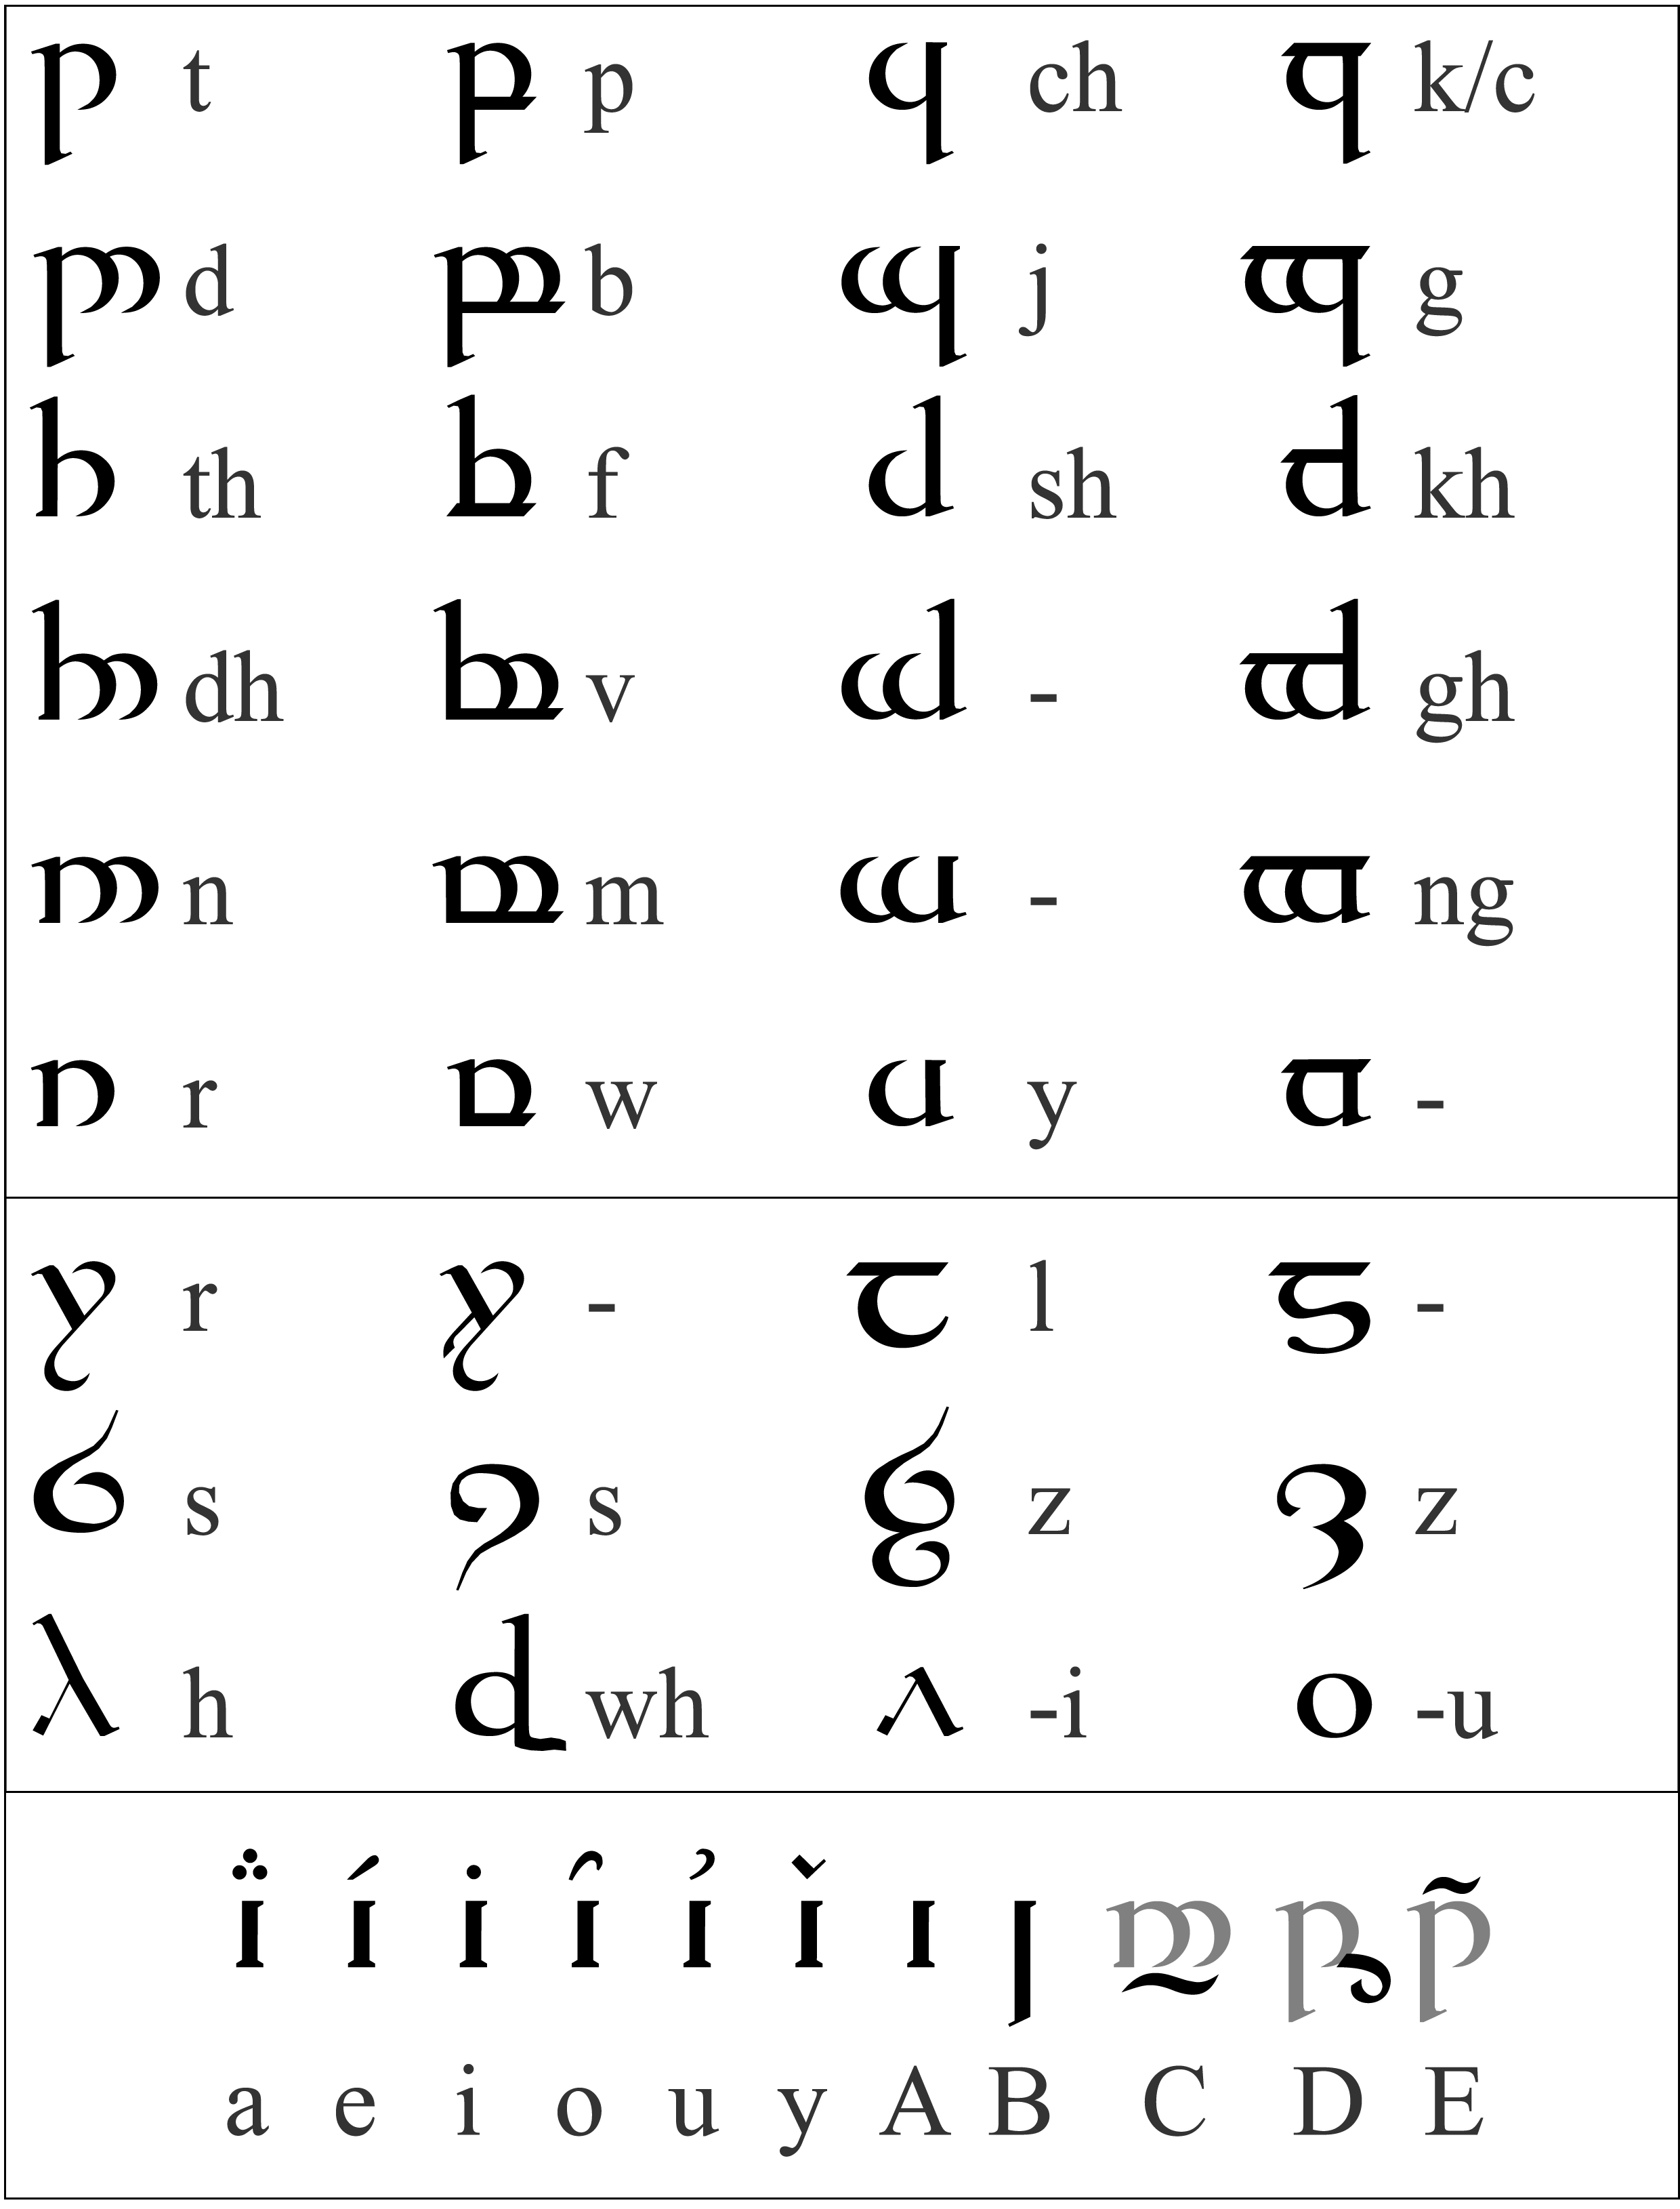 Anglu abeceles rasyba